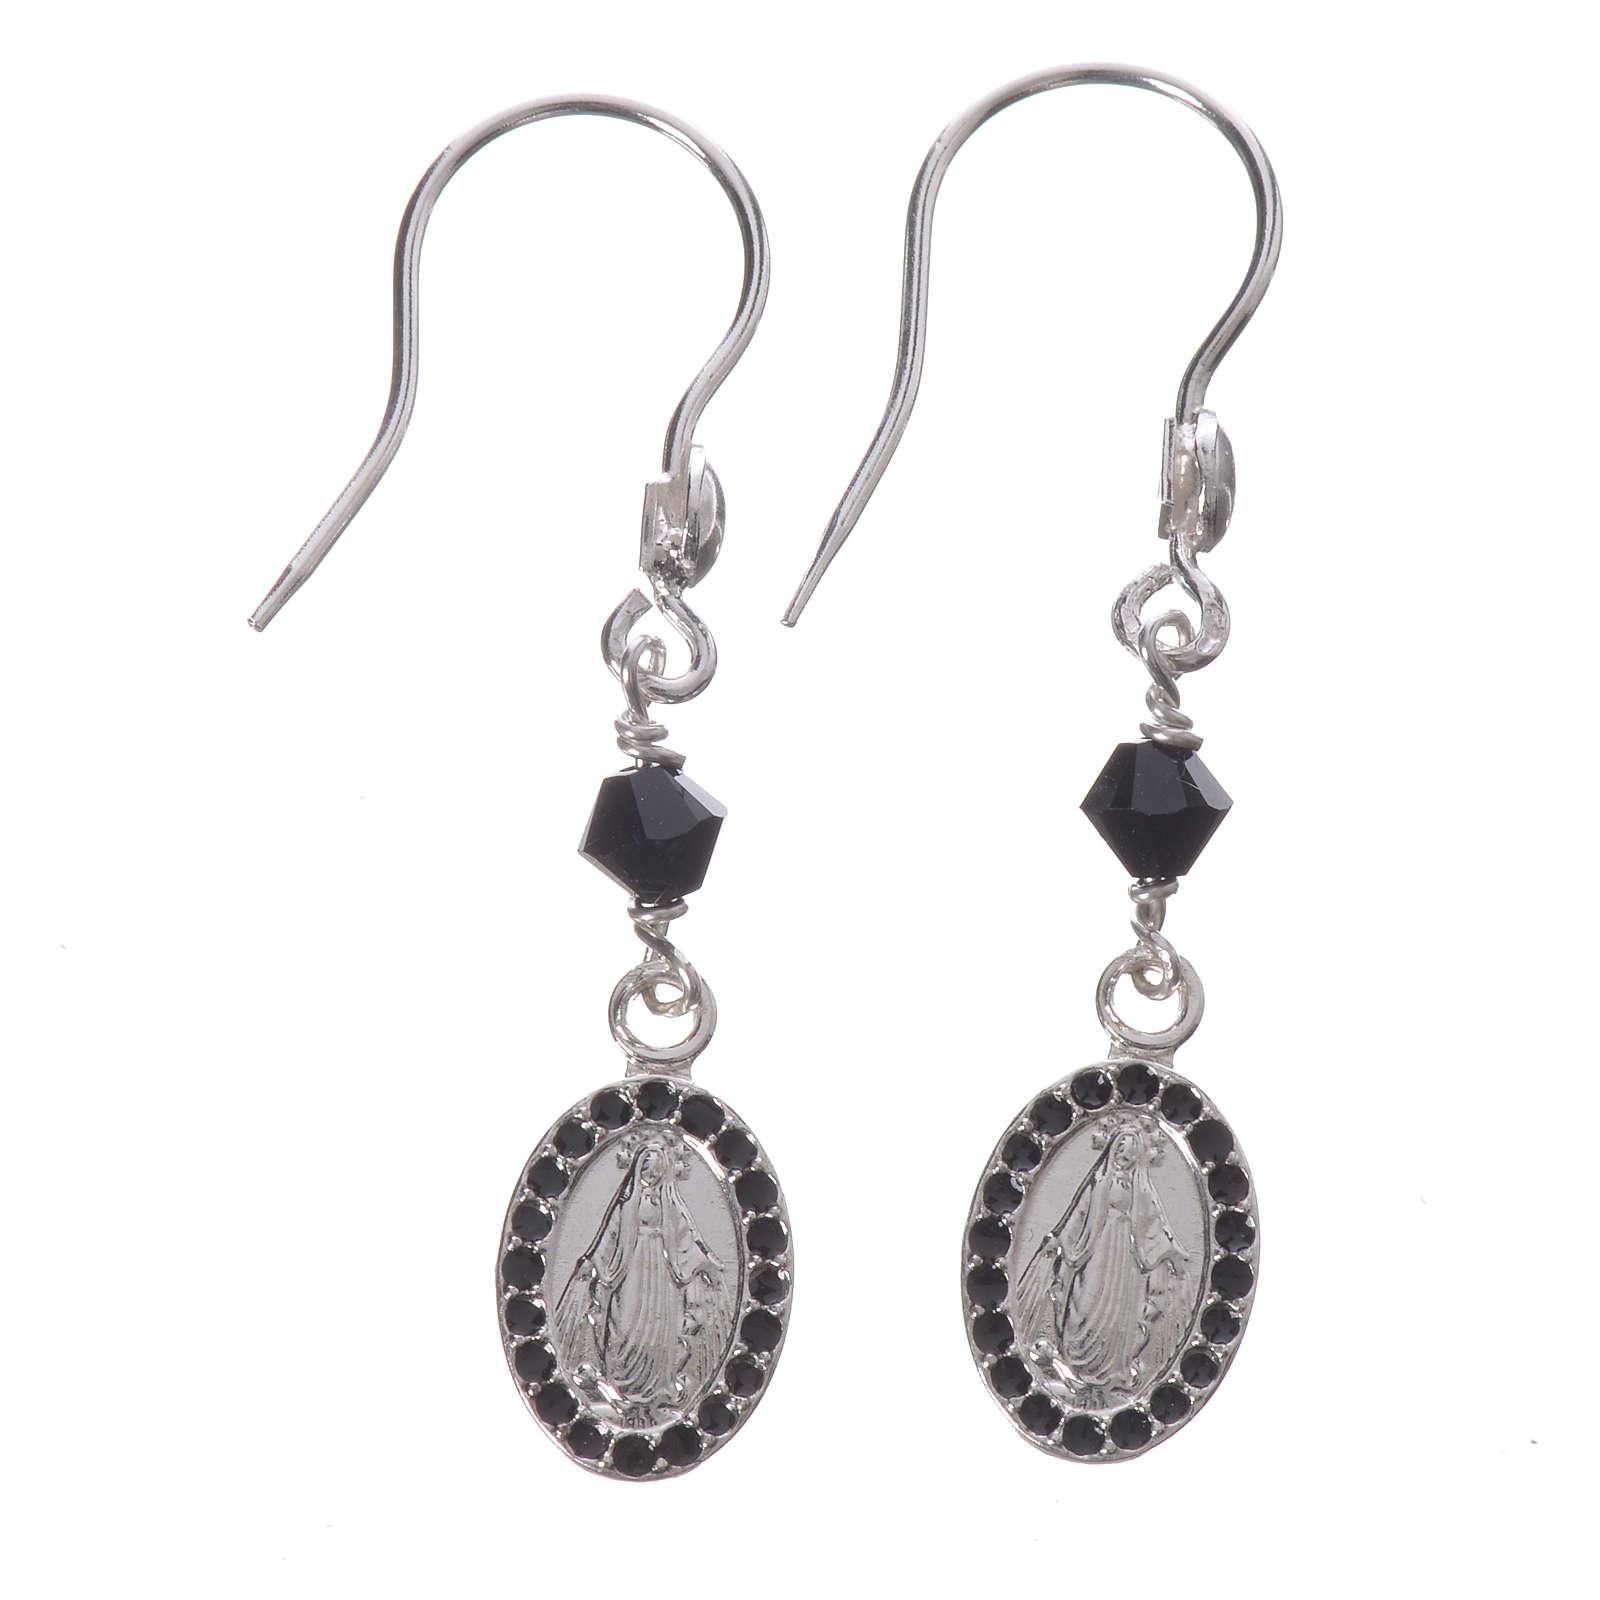 Earrings in 925 silver with Miraculous Medal in black 4